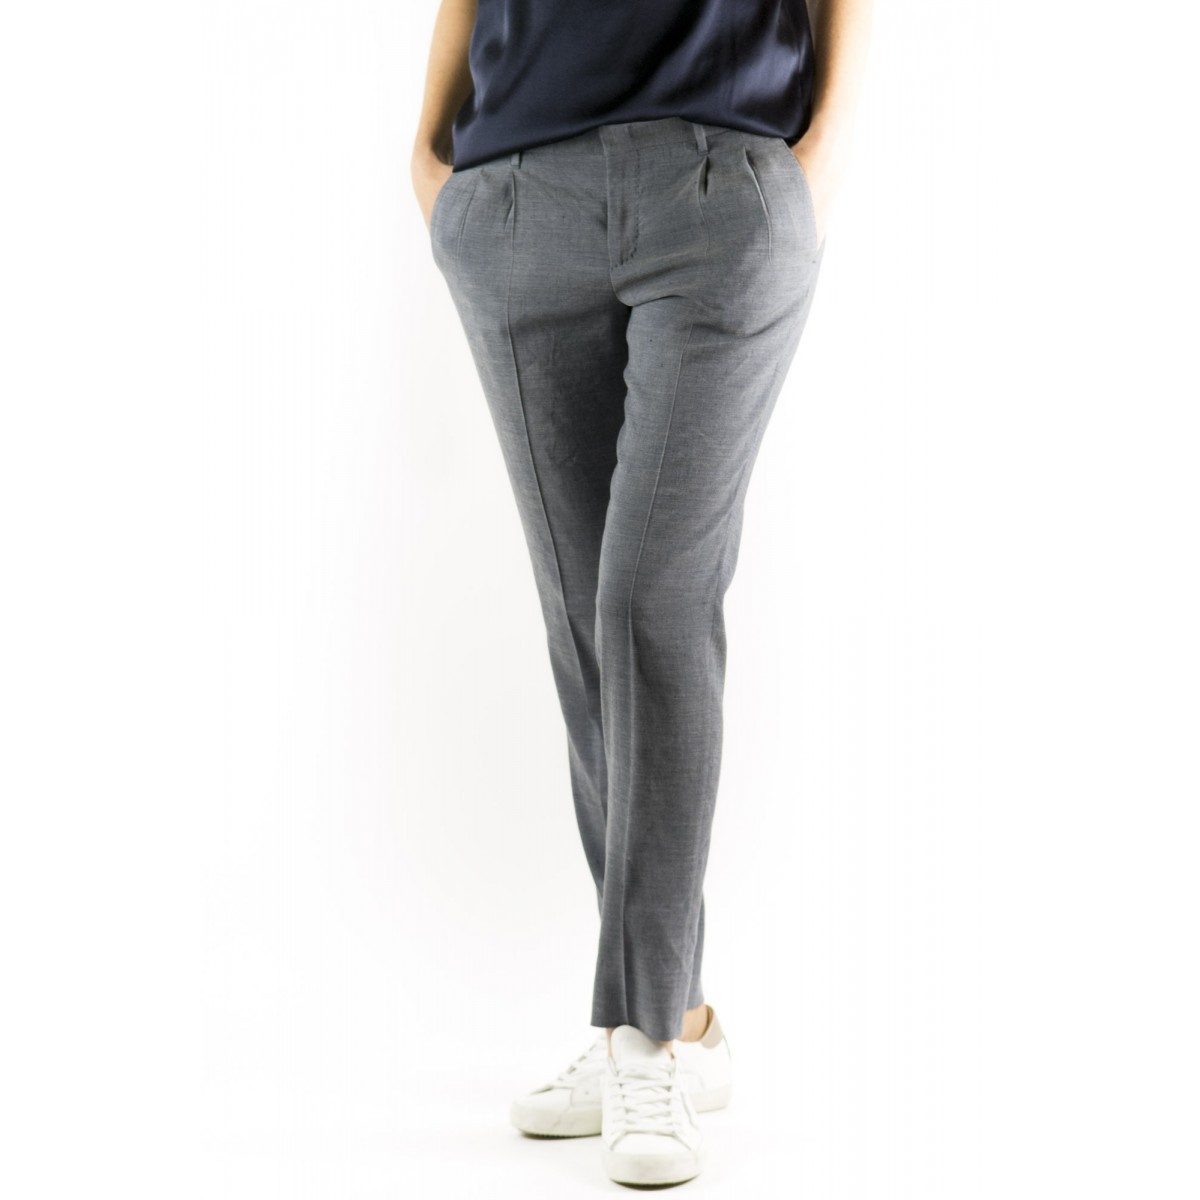 Pantalone PT0W Donna - Cdvsc2 Fb31 Lino Strech